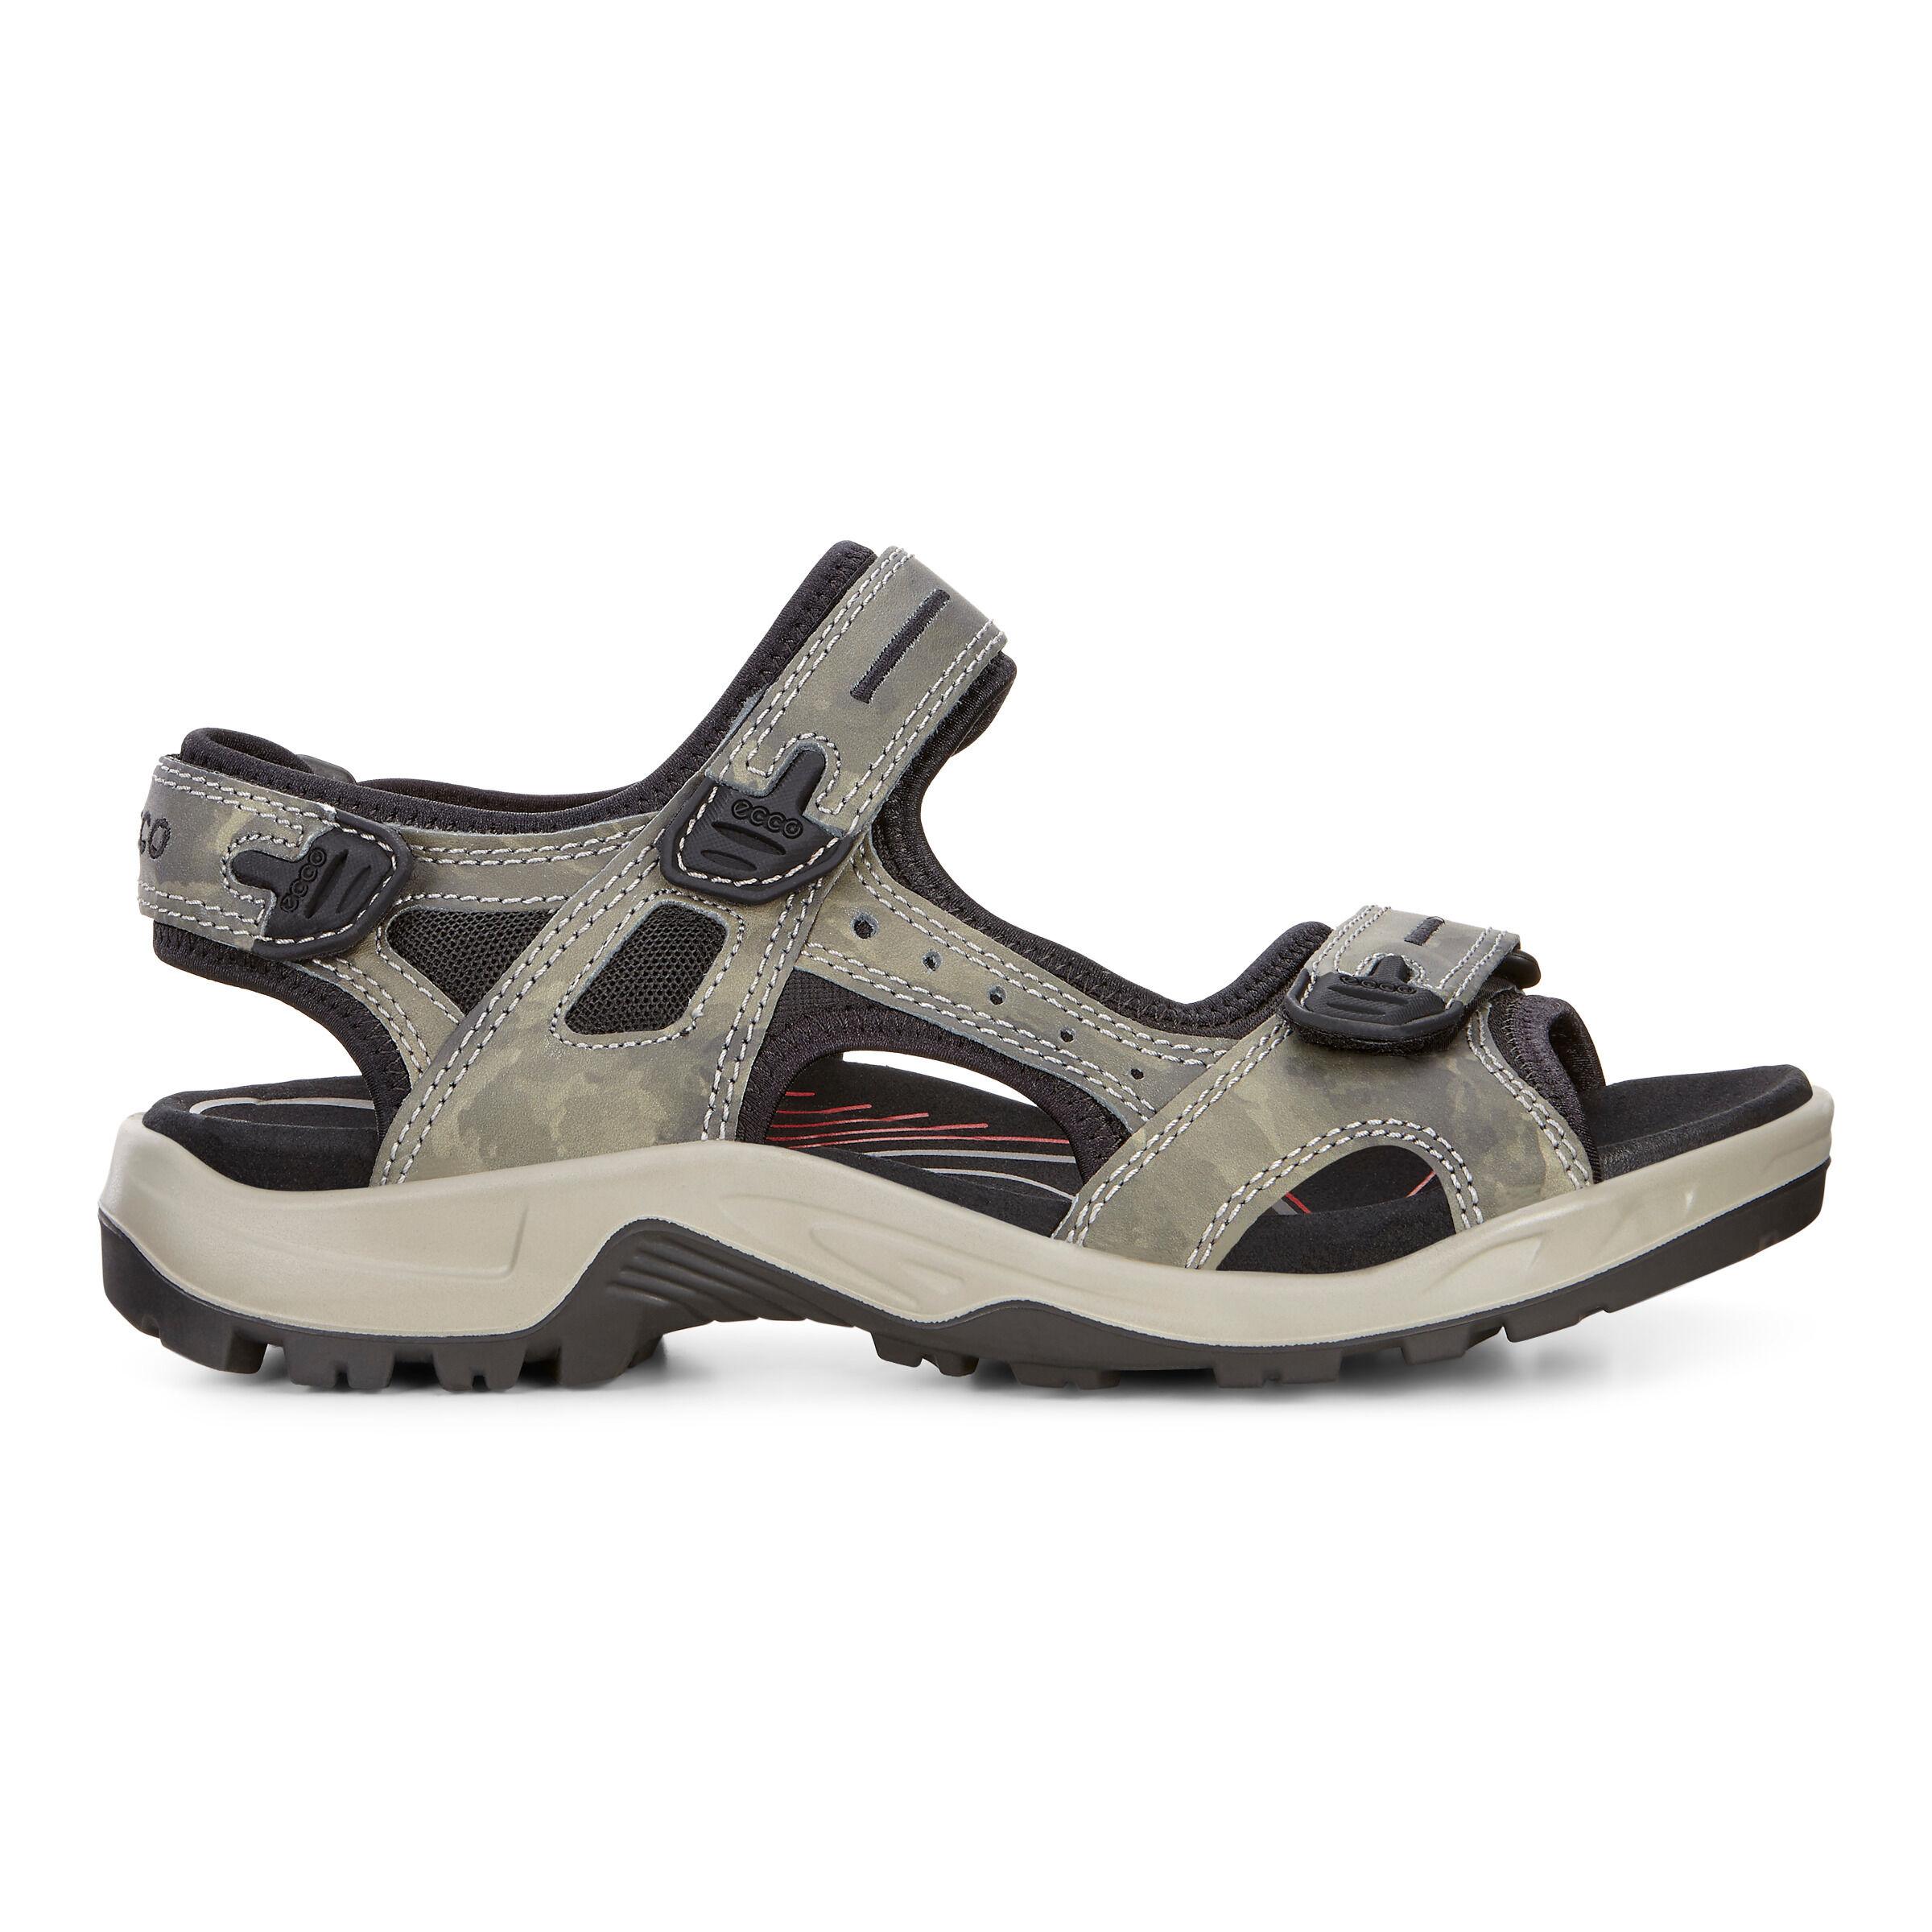 Men's Ecco® SandalHiking Sandals Shoes Ecco Yucatan KJFl1c